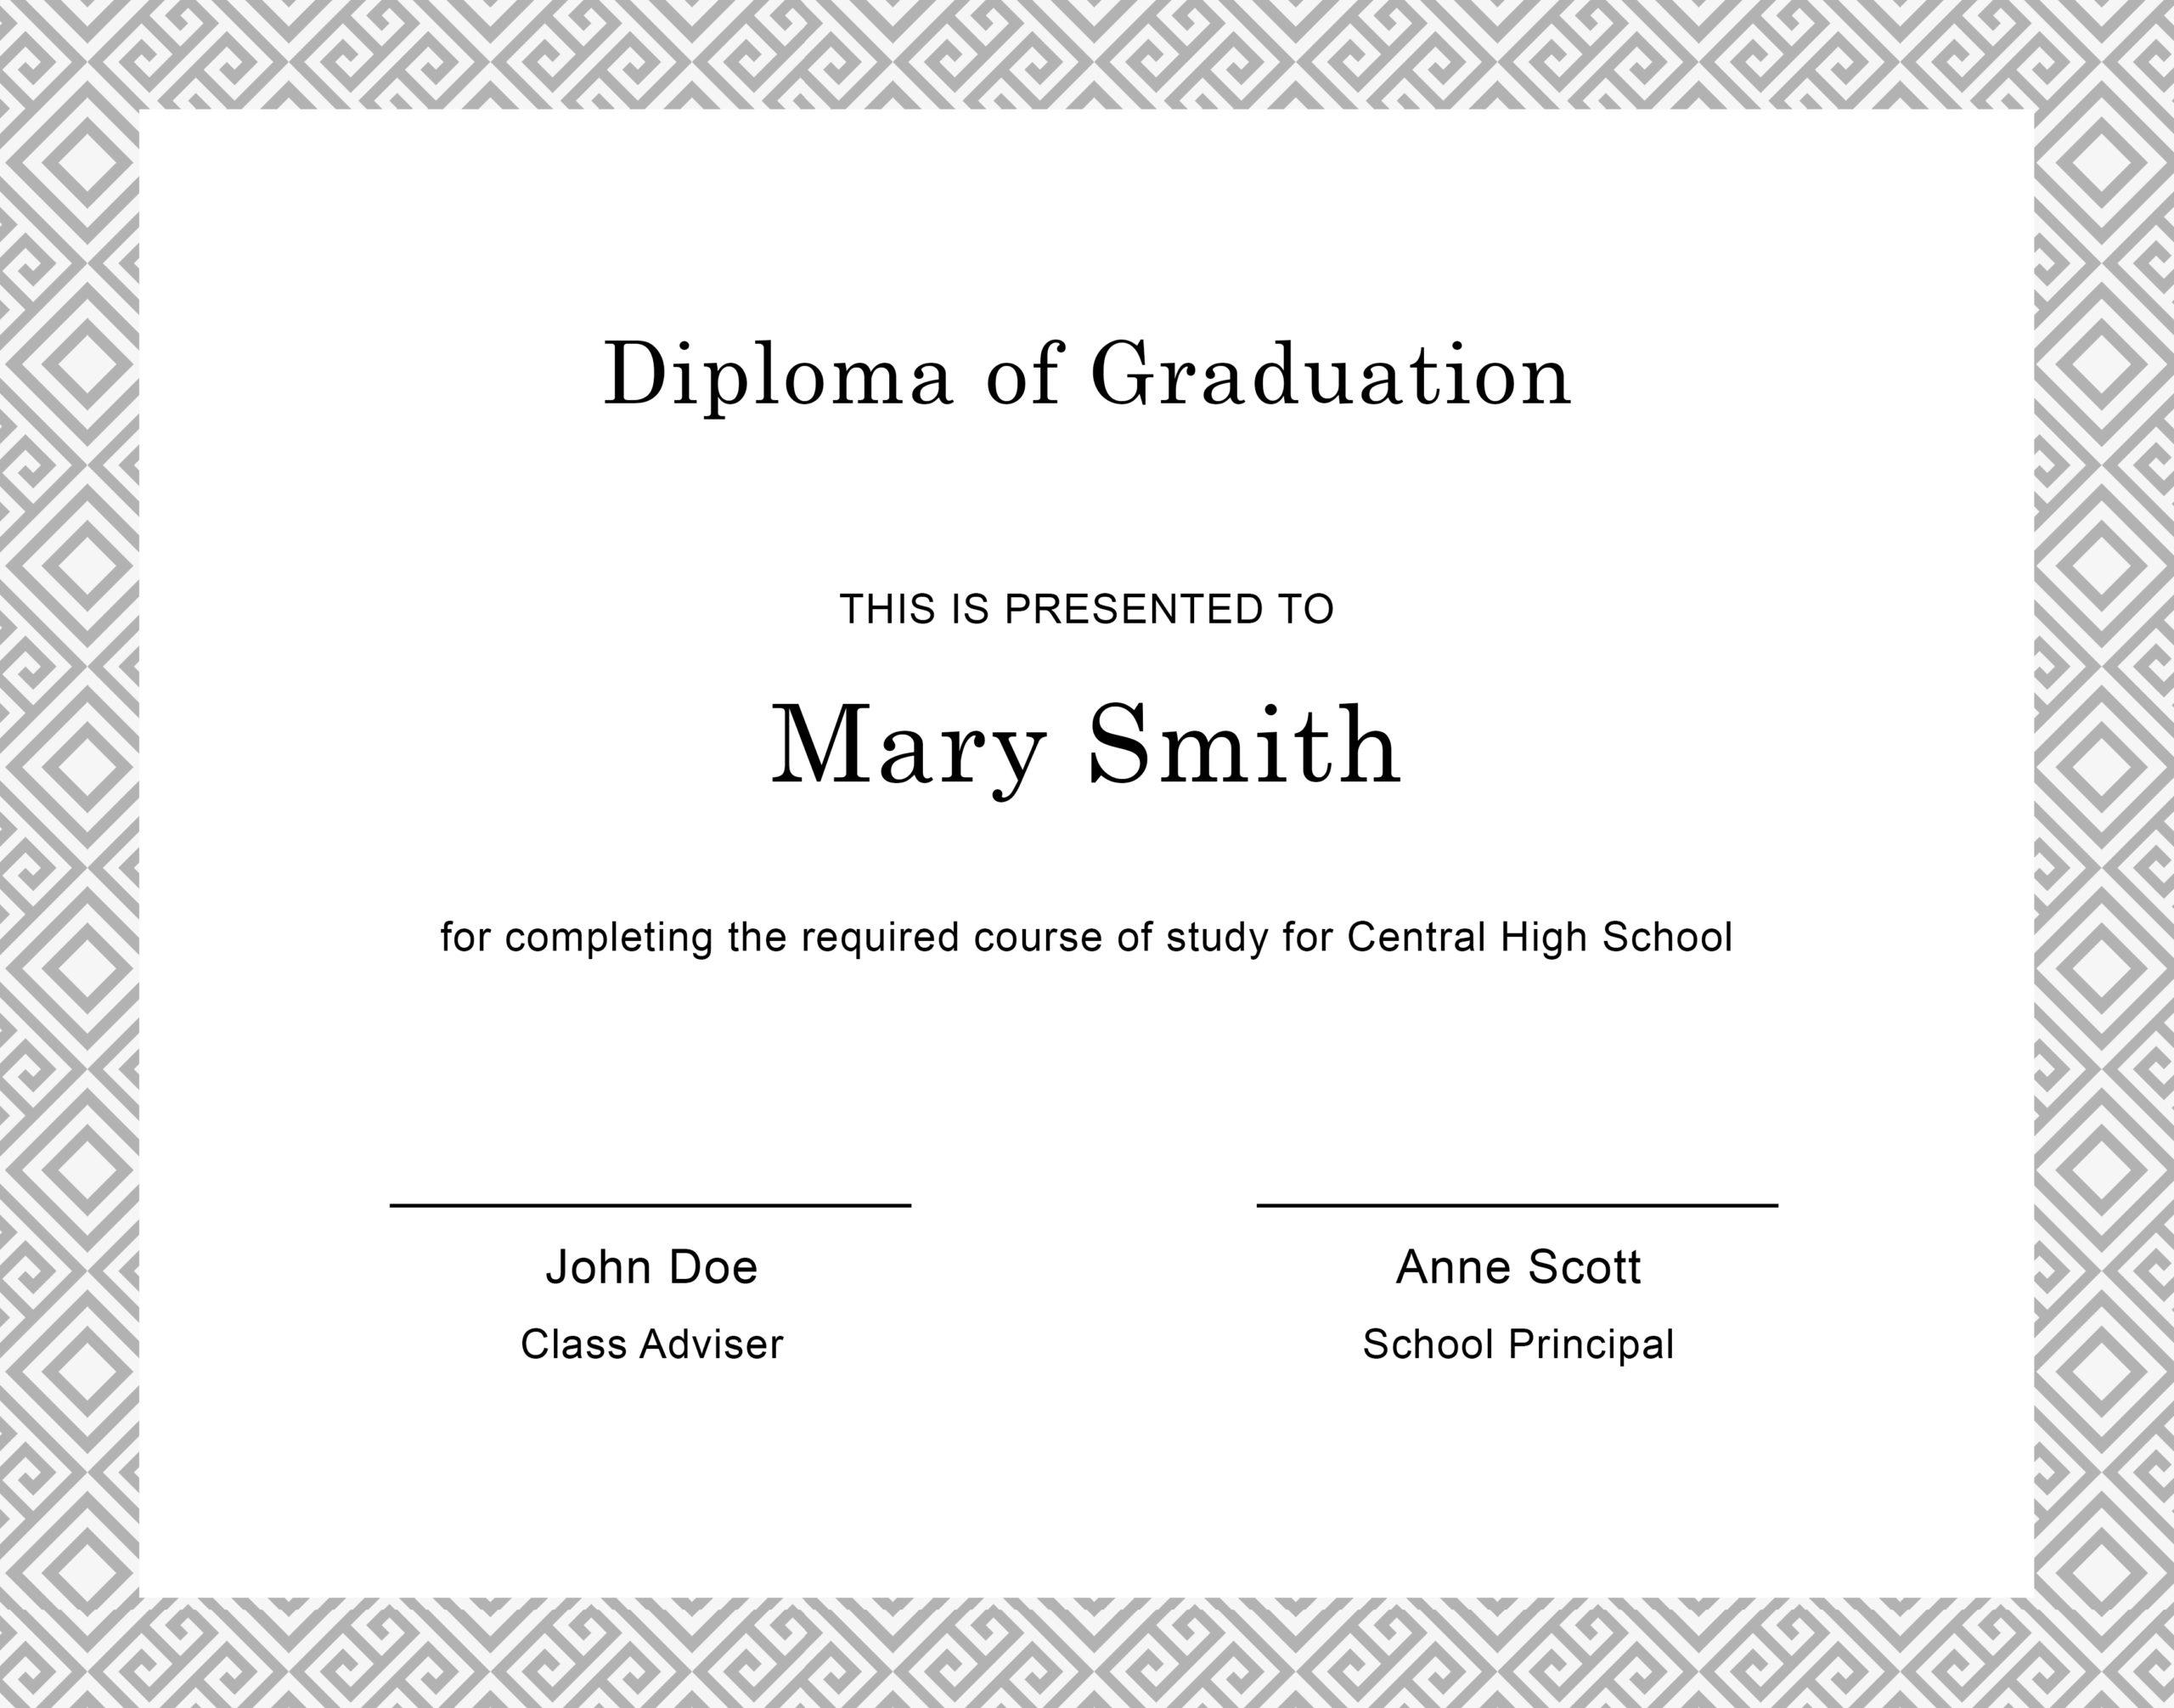 Free Diploma Template 1 - TemplateLab.com